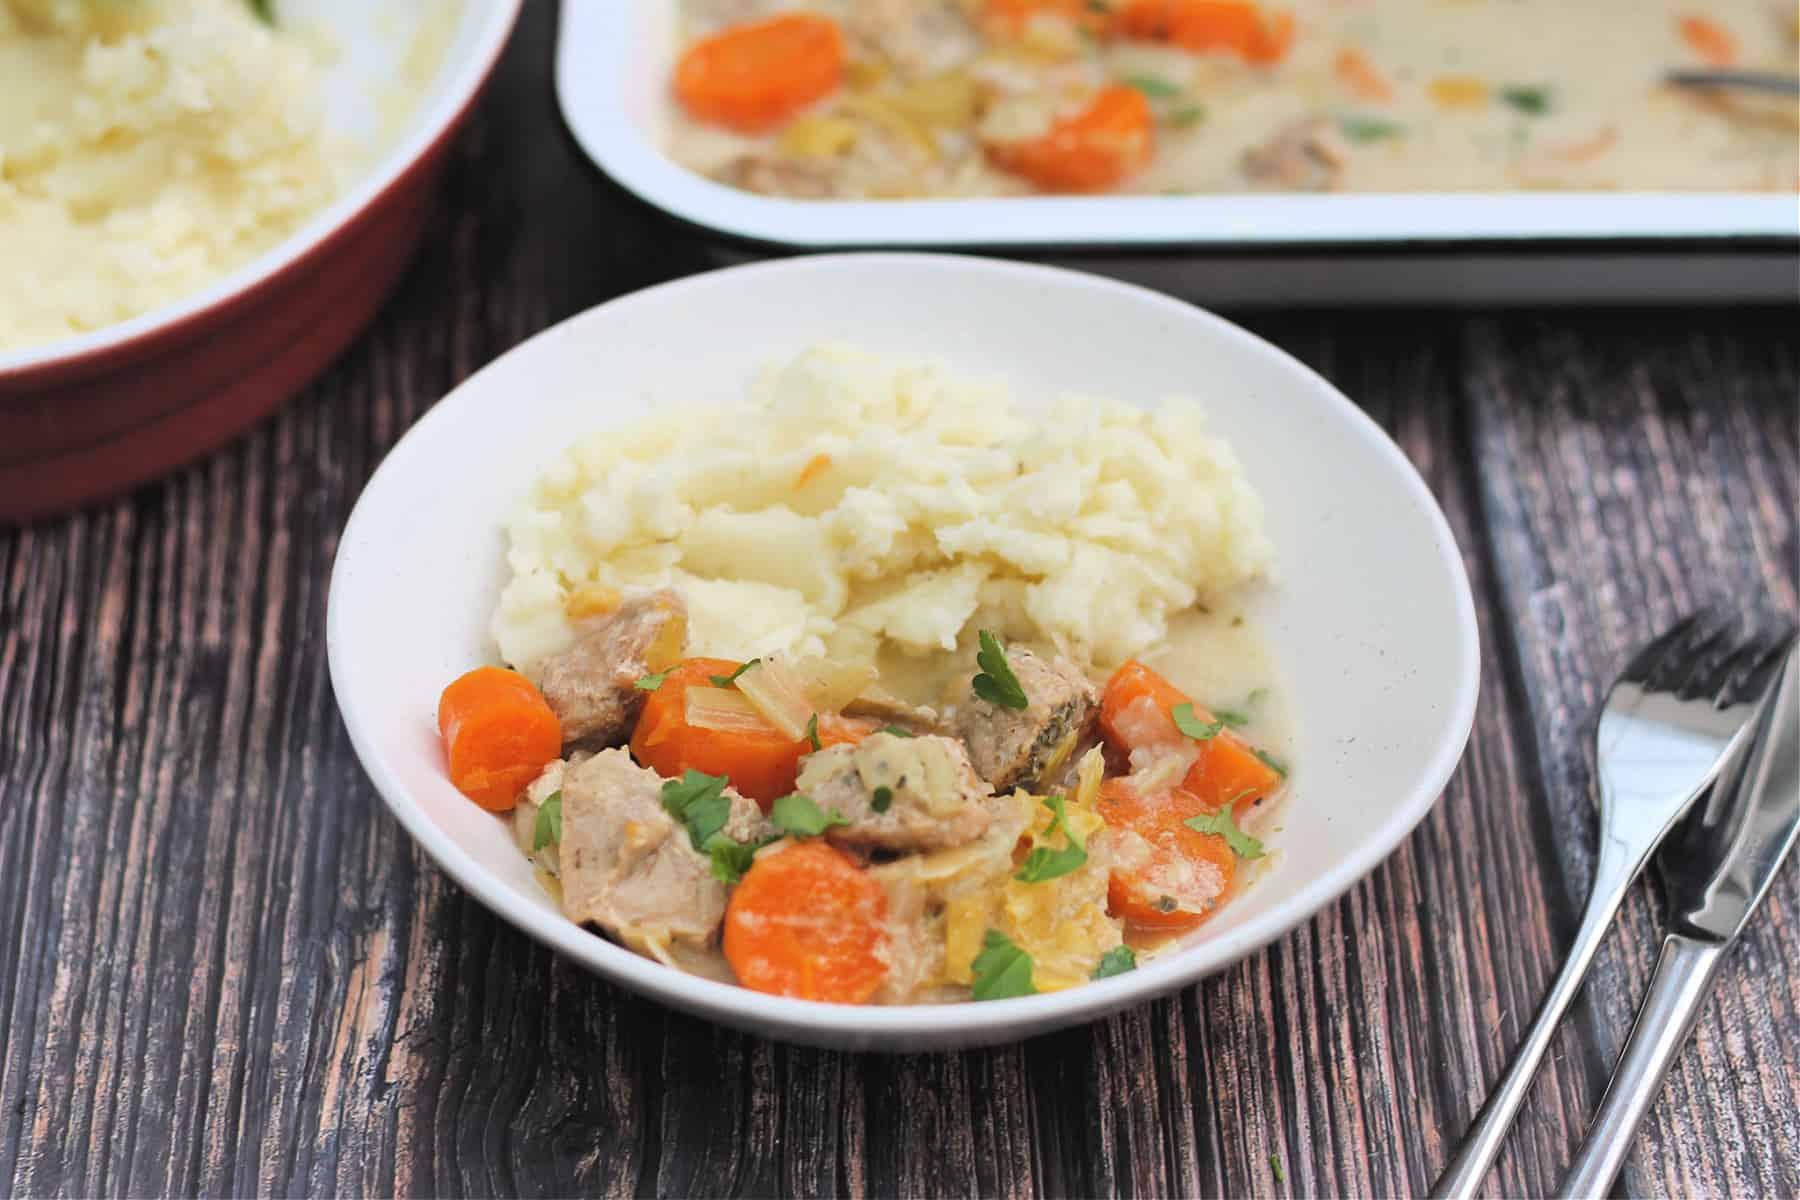 Bowl of pork casserole with cutlery beside.